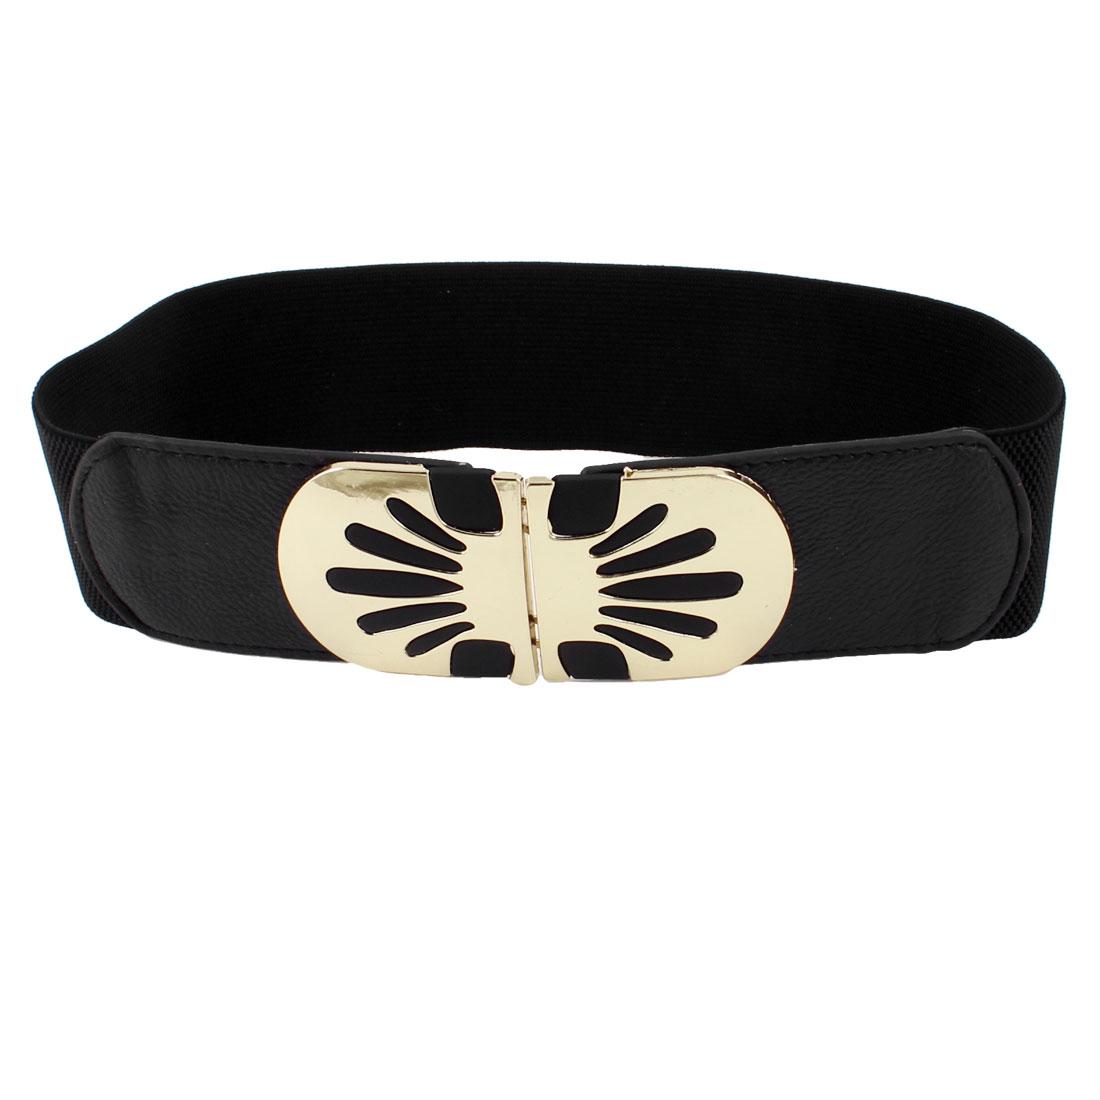 Ladies Two Tone Interlock Buckle Textured Stretch Stretchy High Waist Belt Black